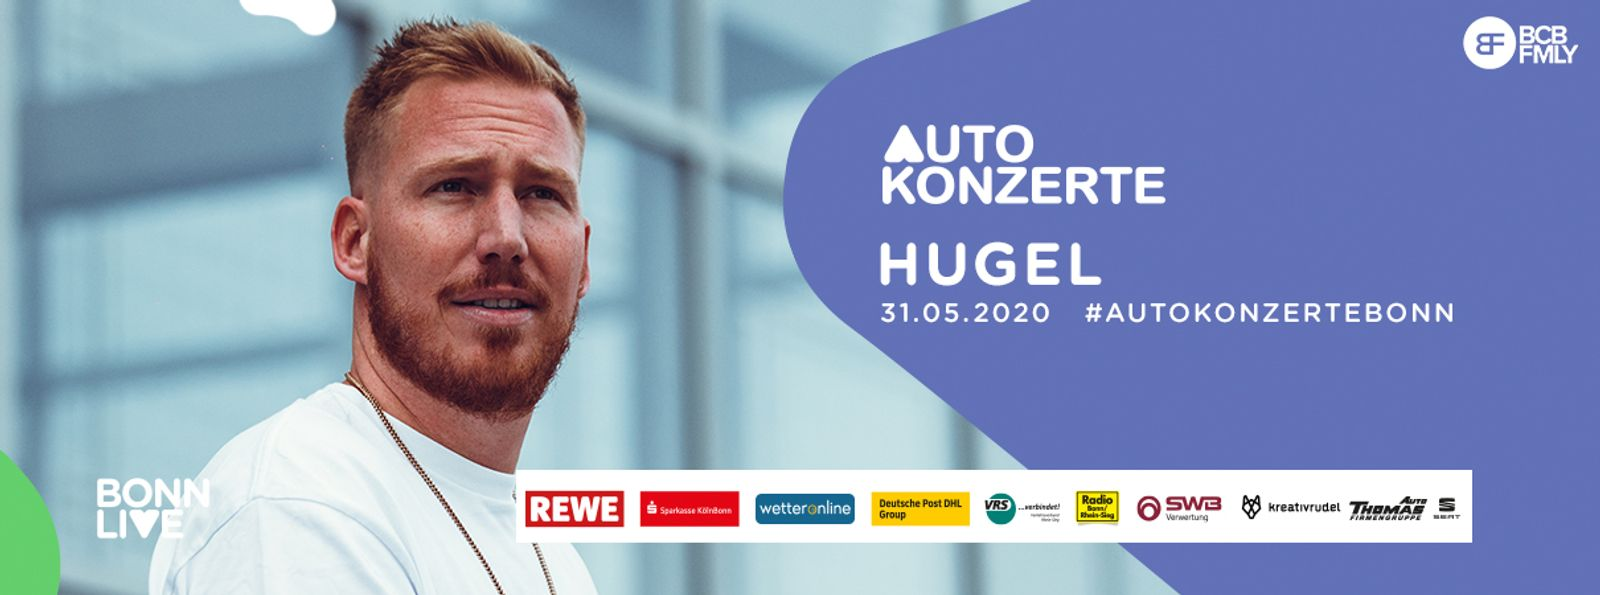 HUGEL   BonnLive Autokonzerte